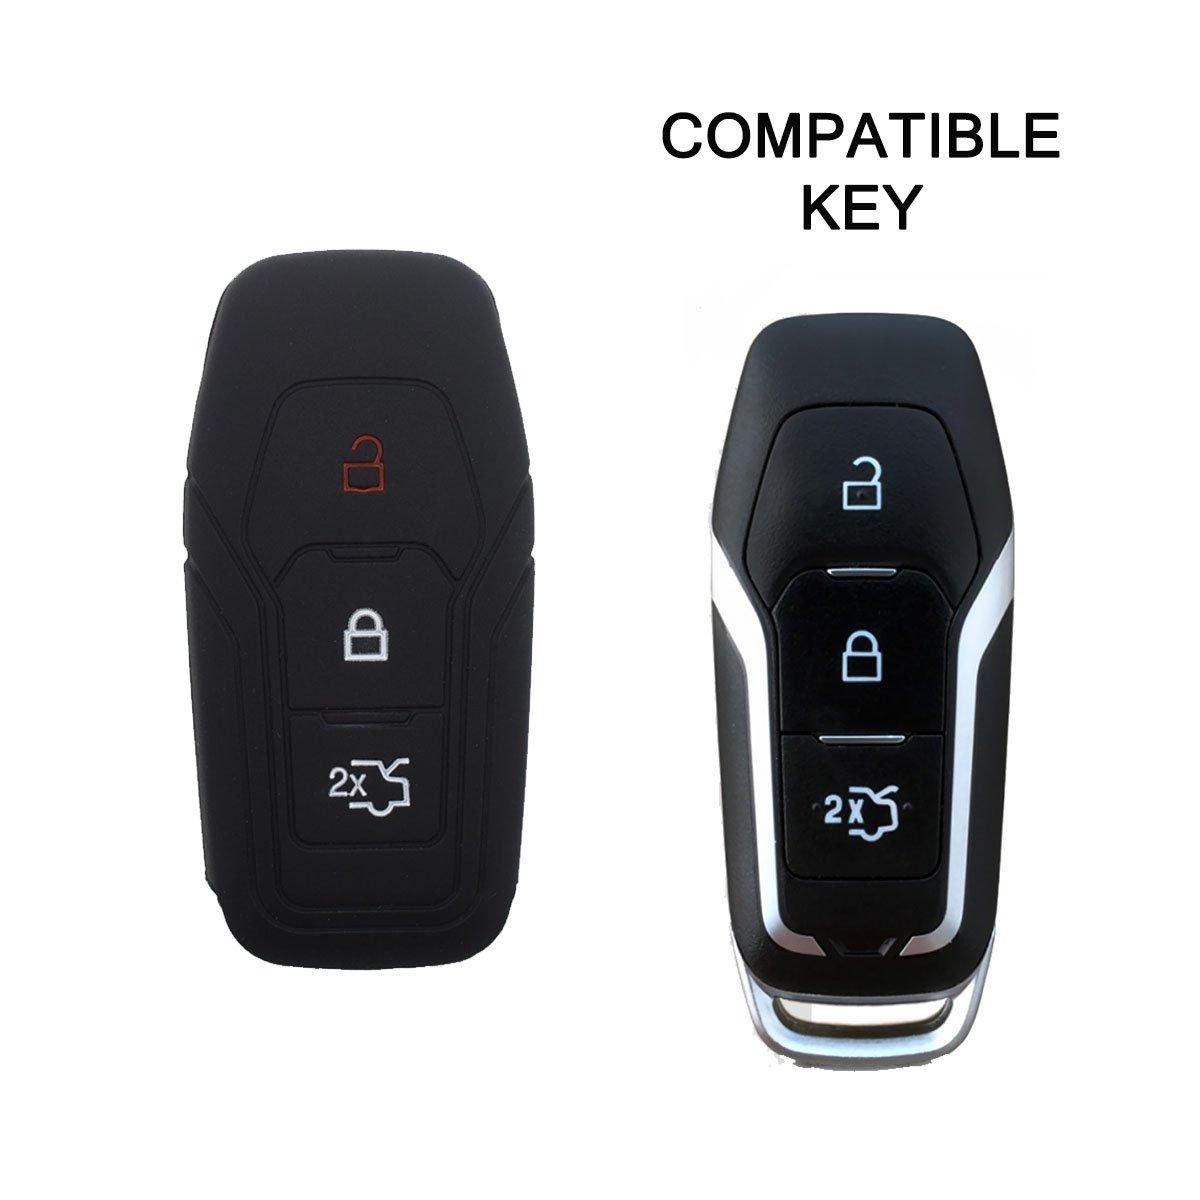 Coque de Silicone Cover Cl/é pour T/él/écommande Ford Kuga Mondeo Focus Ka B-Max Edge Fiesta Galaxy Mustang S-Max Bleu 3 Boutons